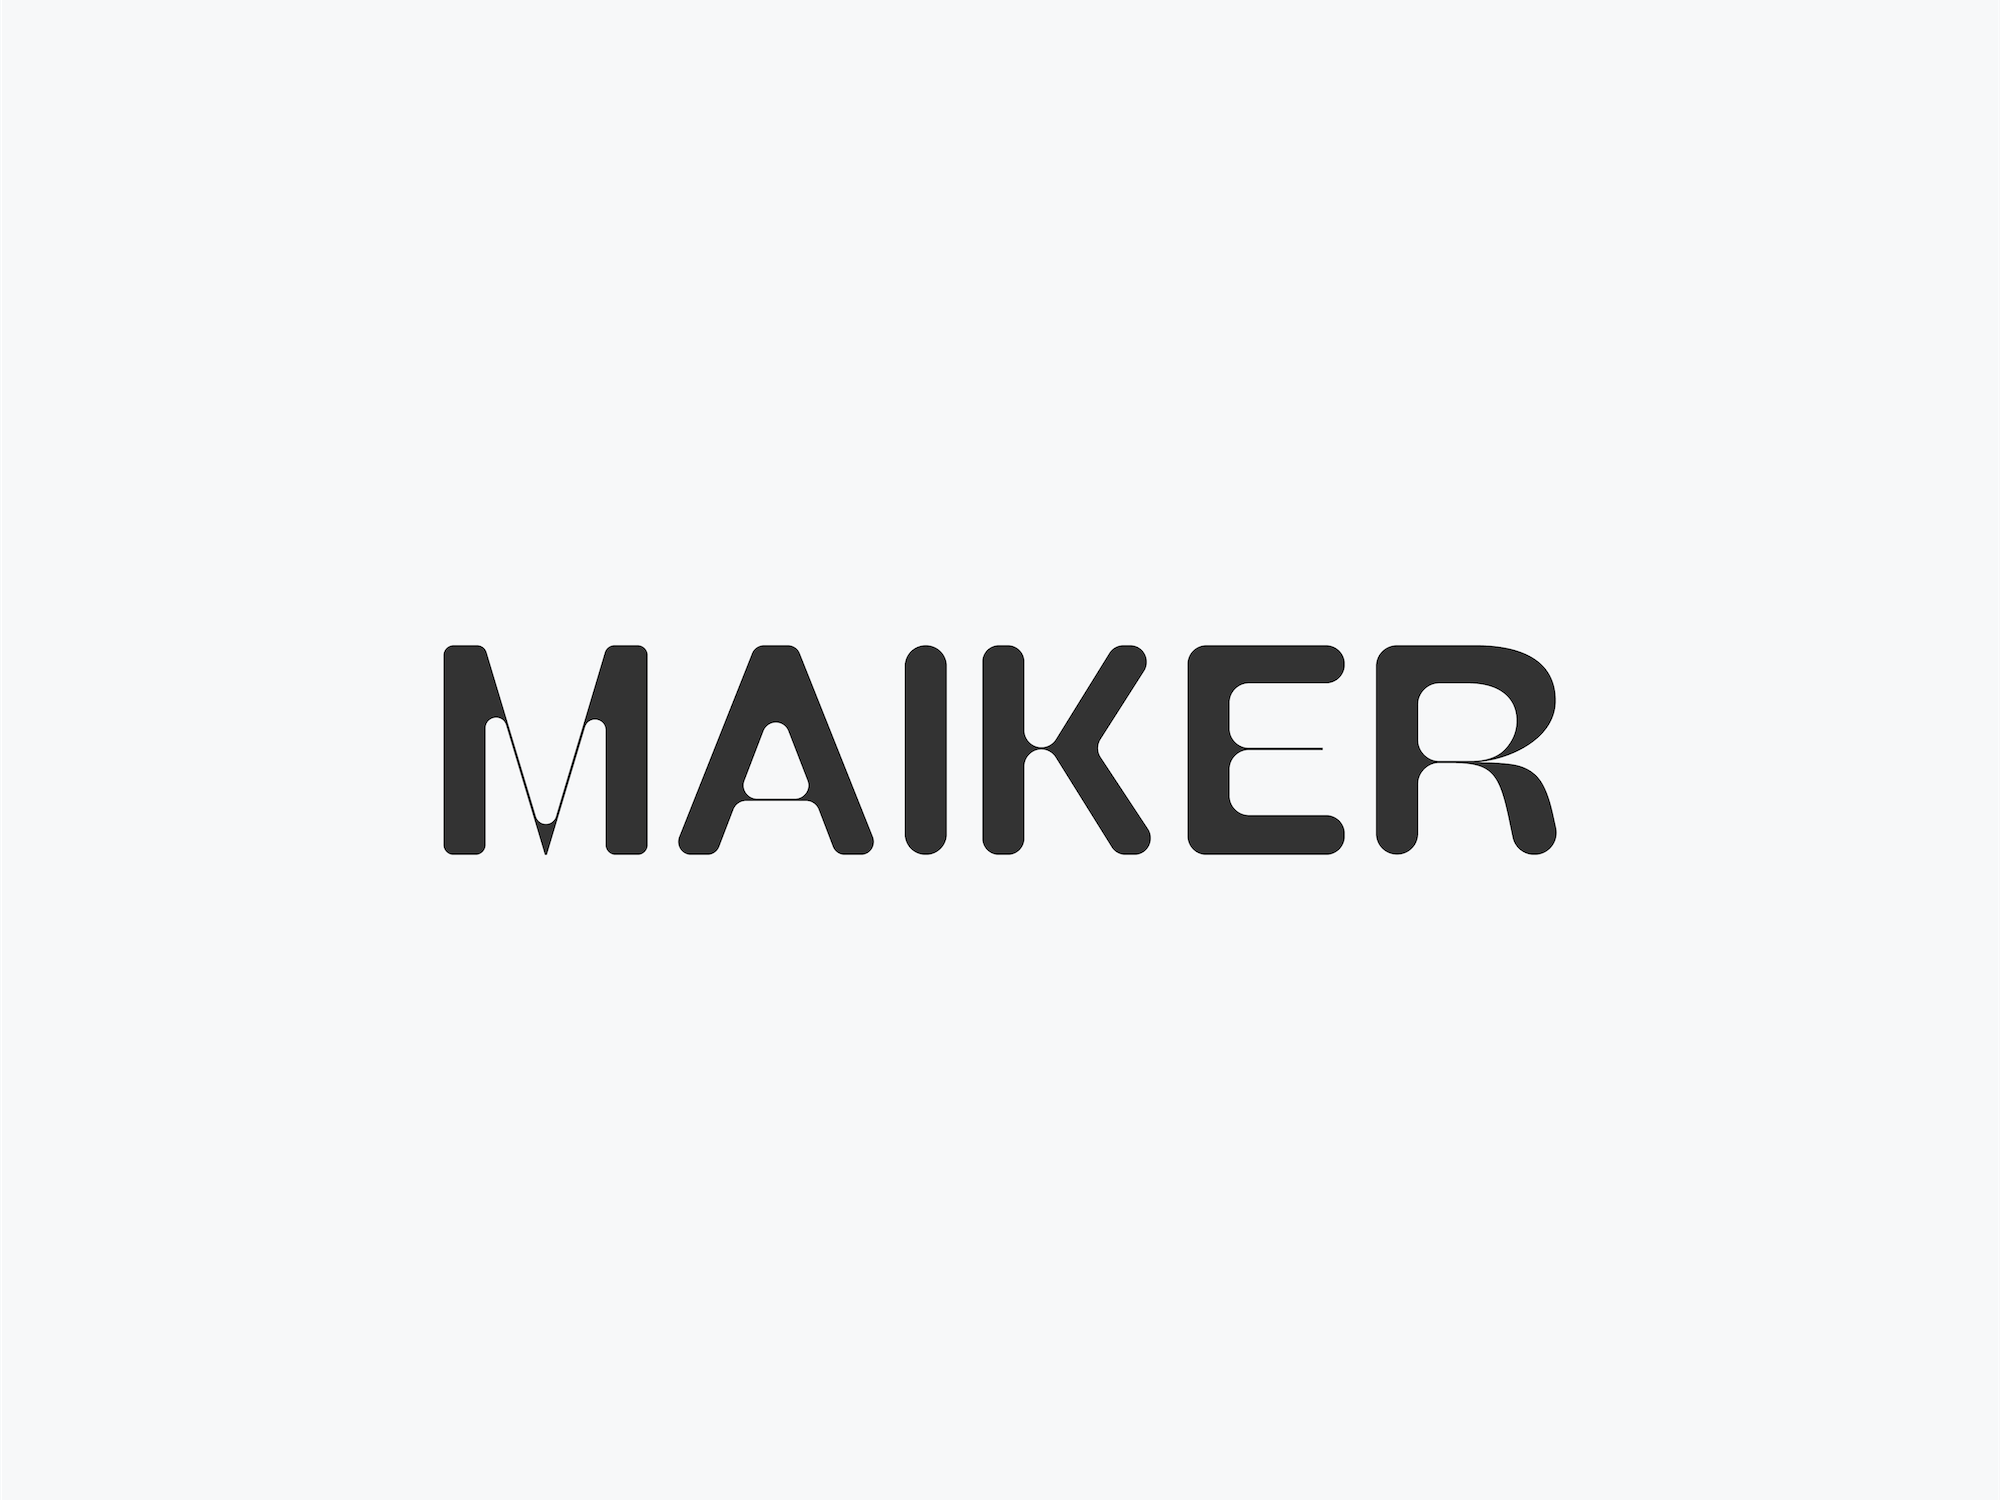 Maiker-09.png